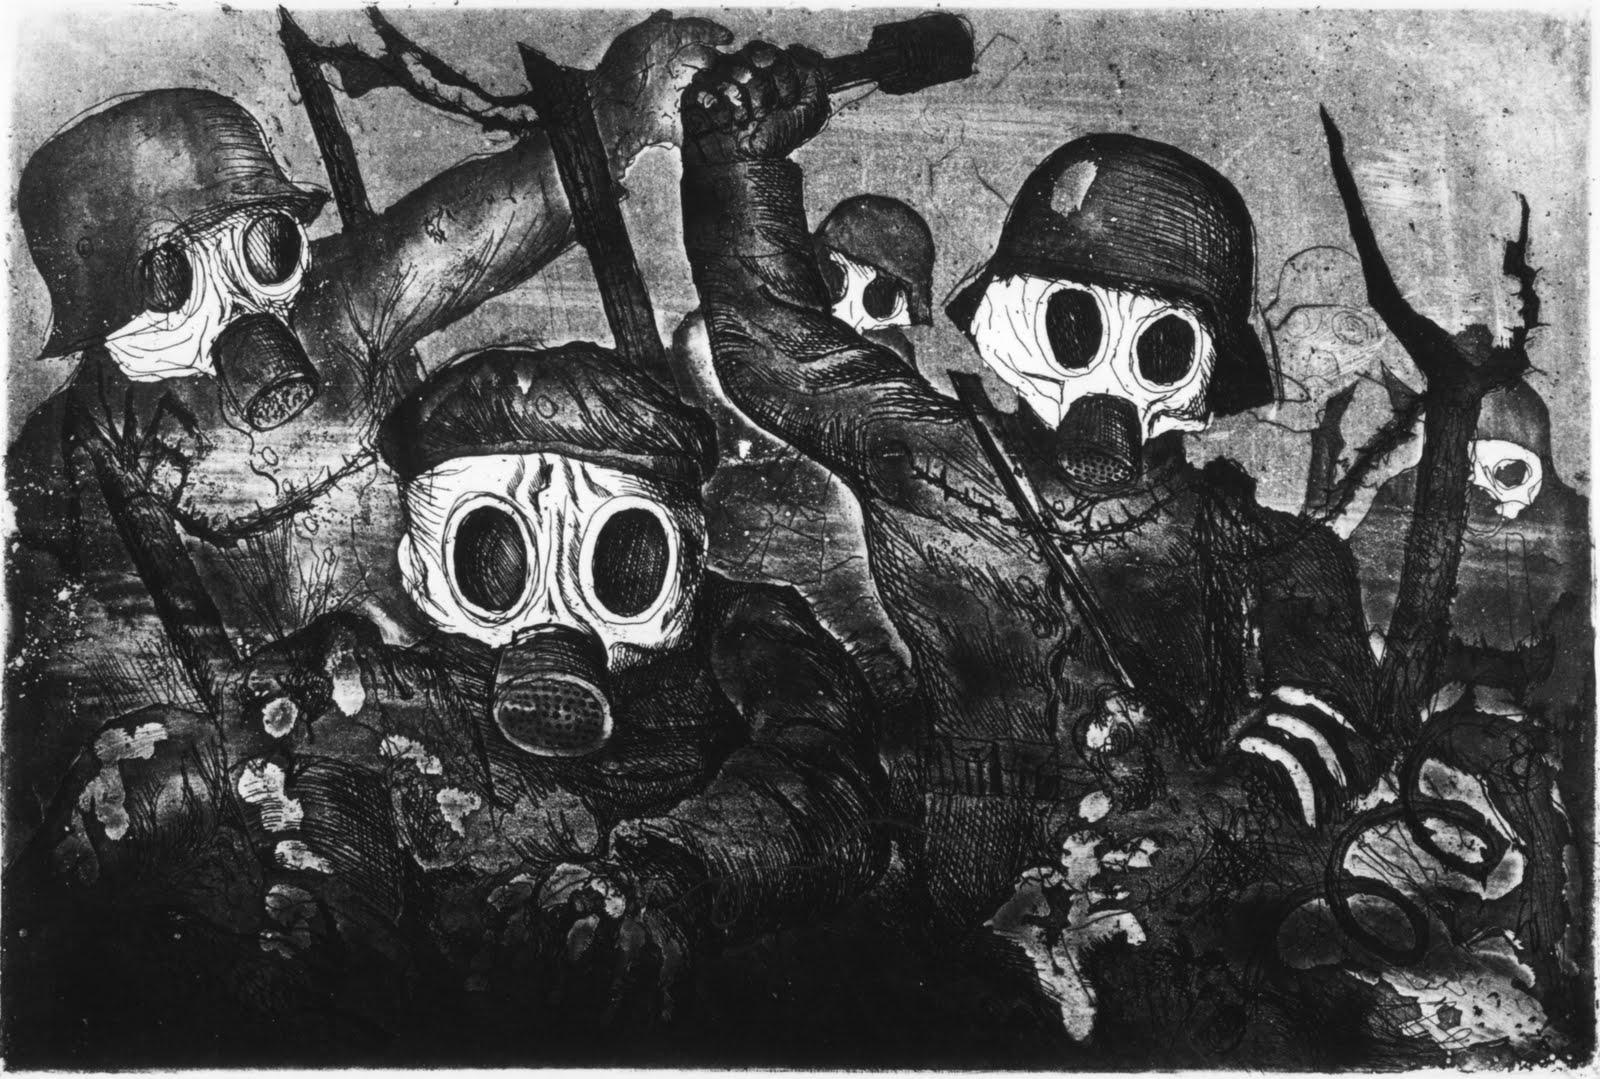 Gasmask terror chemical warfare nuclear holocaust 4